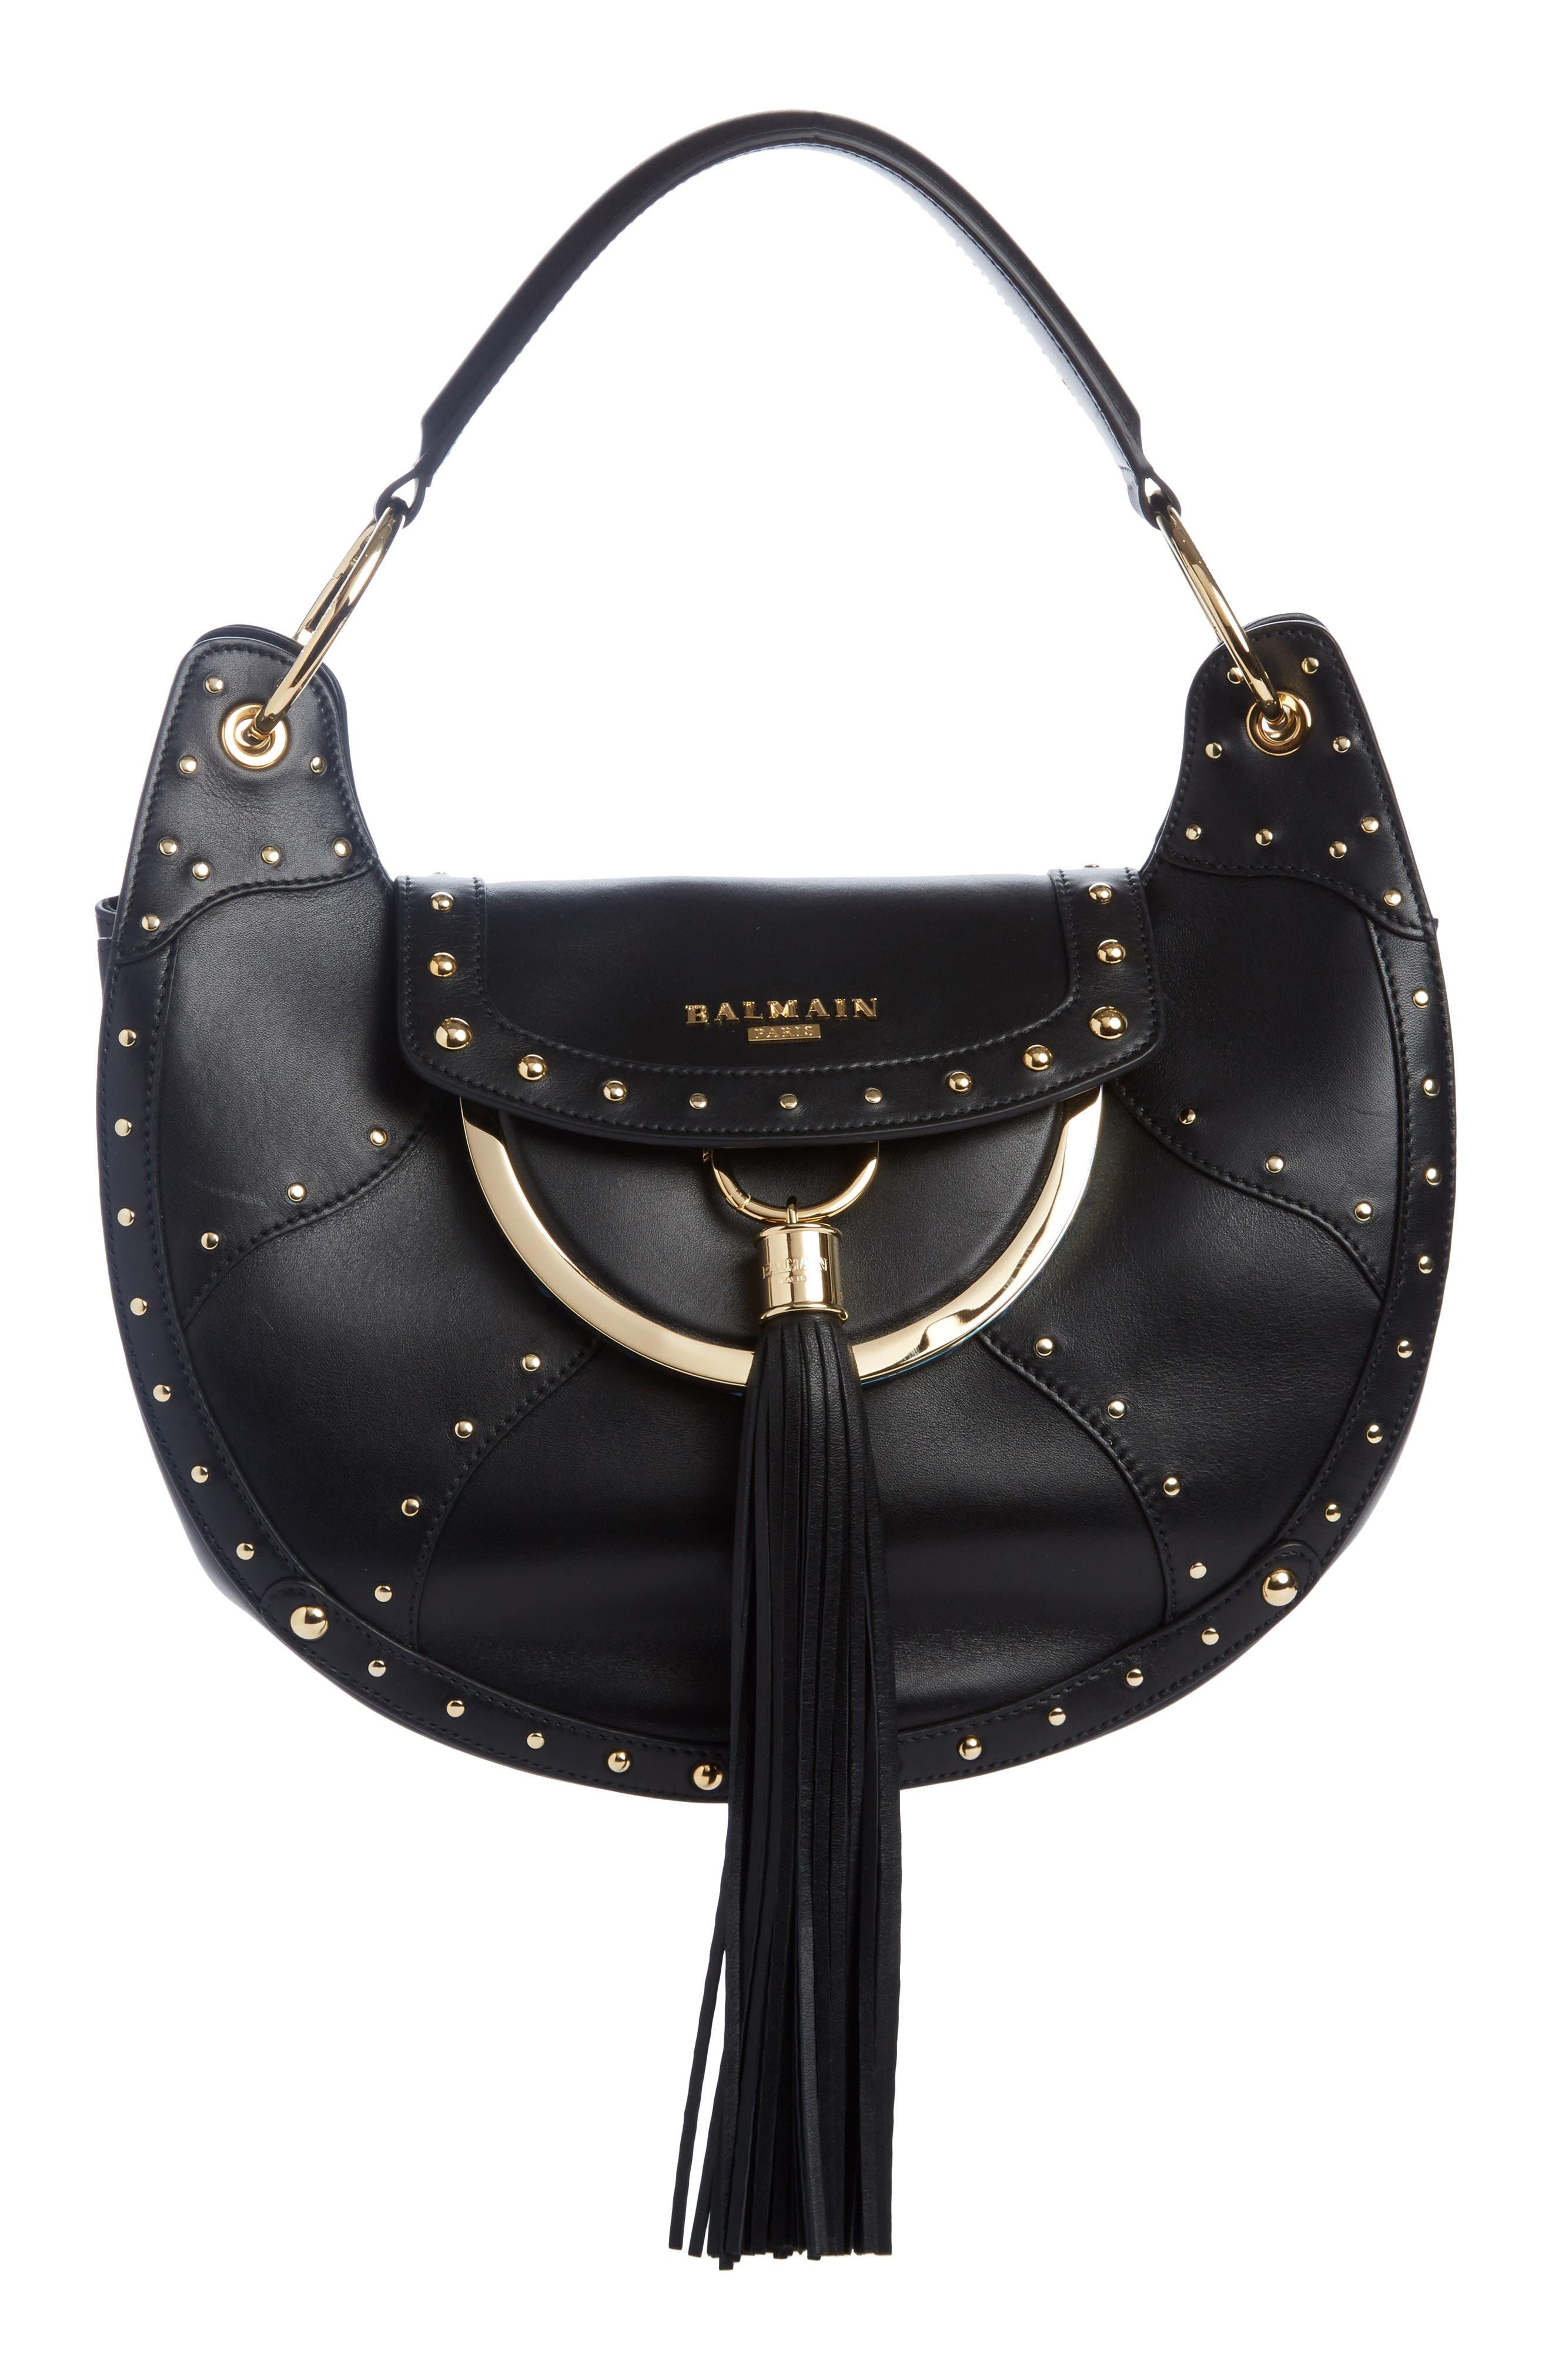 Balmain Domaine Full Moon Leather Shoulder Bag